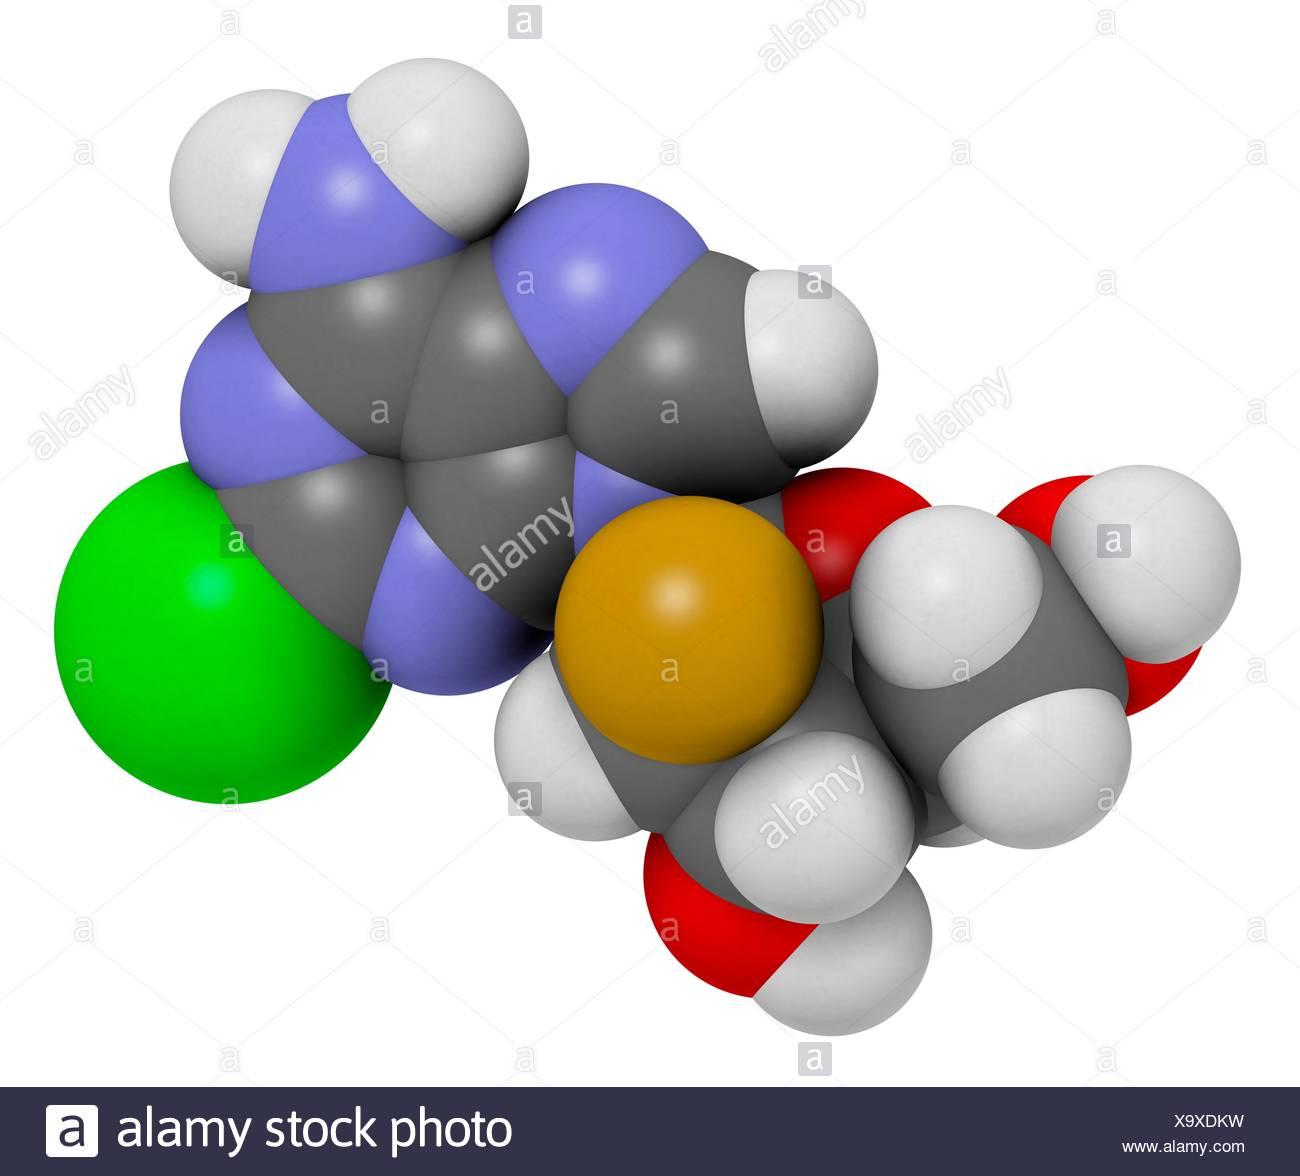 Clofarabine cancer drug molecule (purine nucleoside antimetabolite). Atoms are represented as spheres with c venti al colour - Stock Image